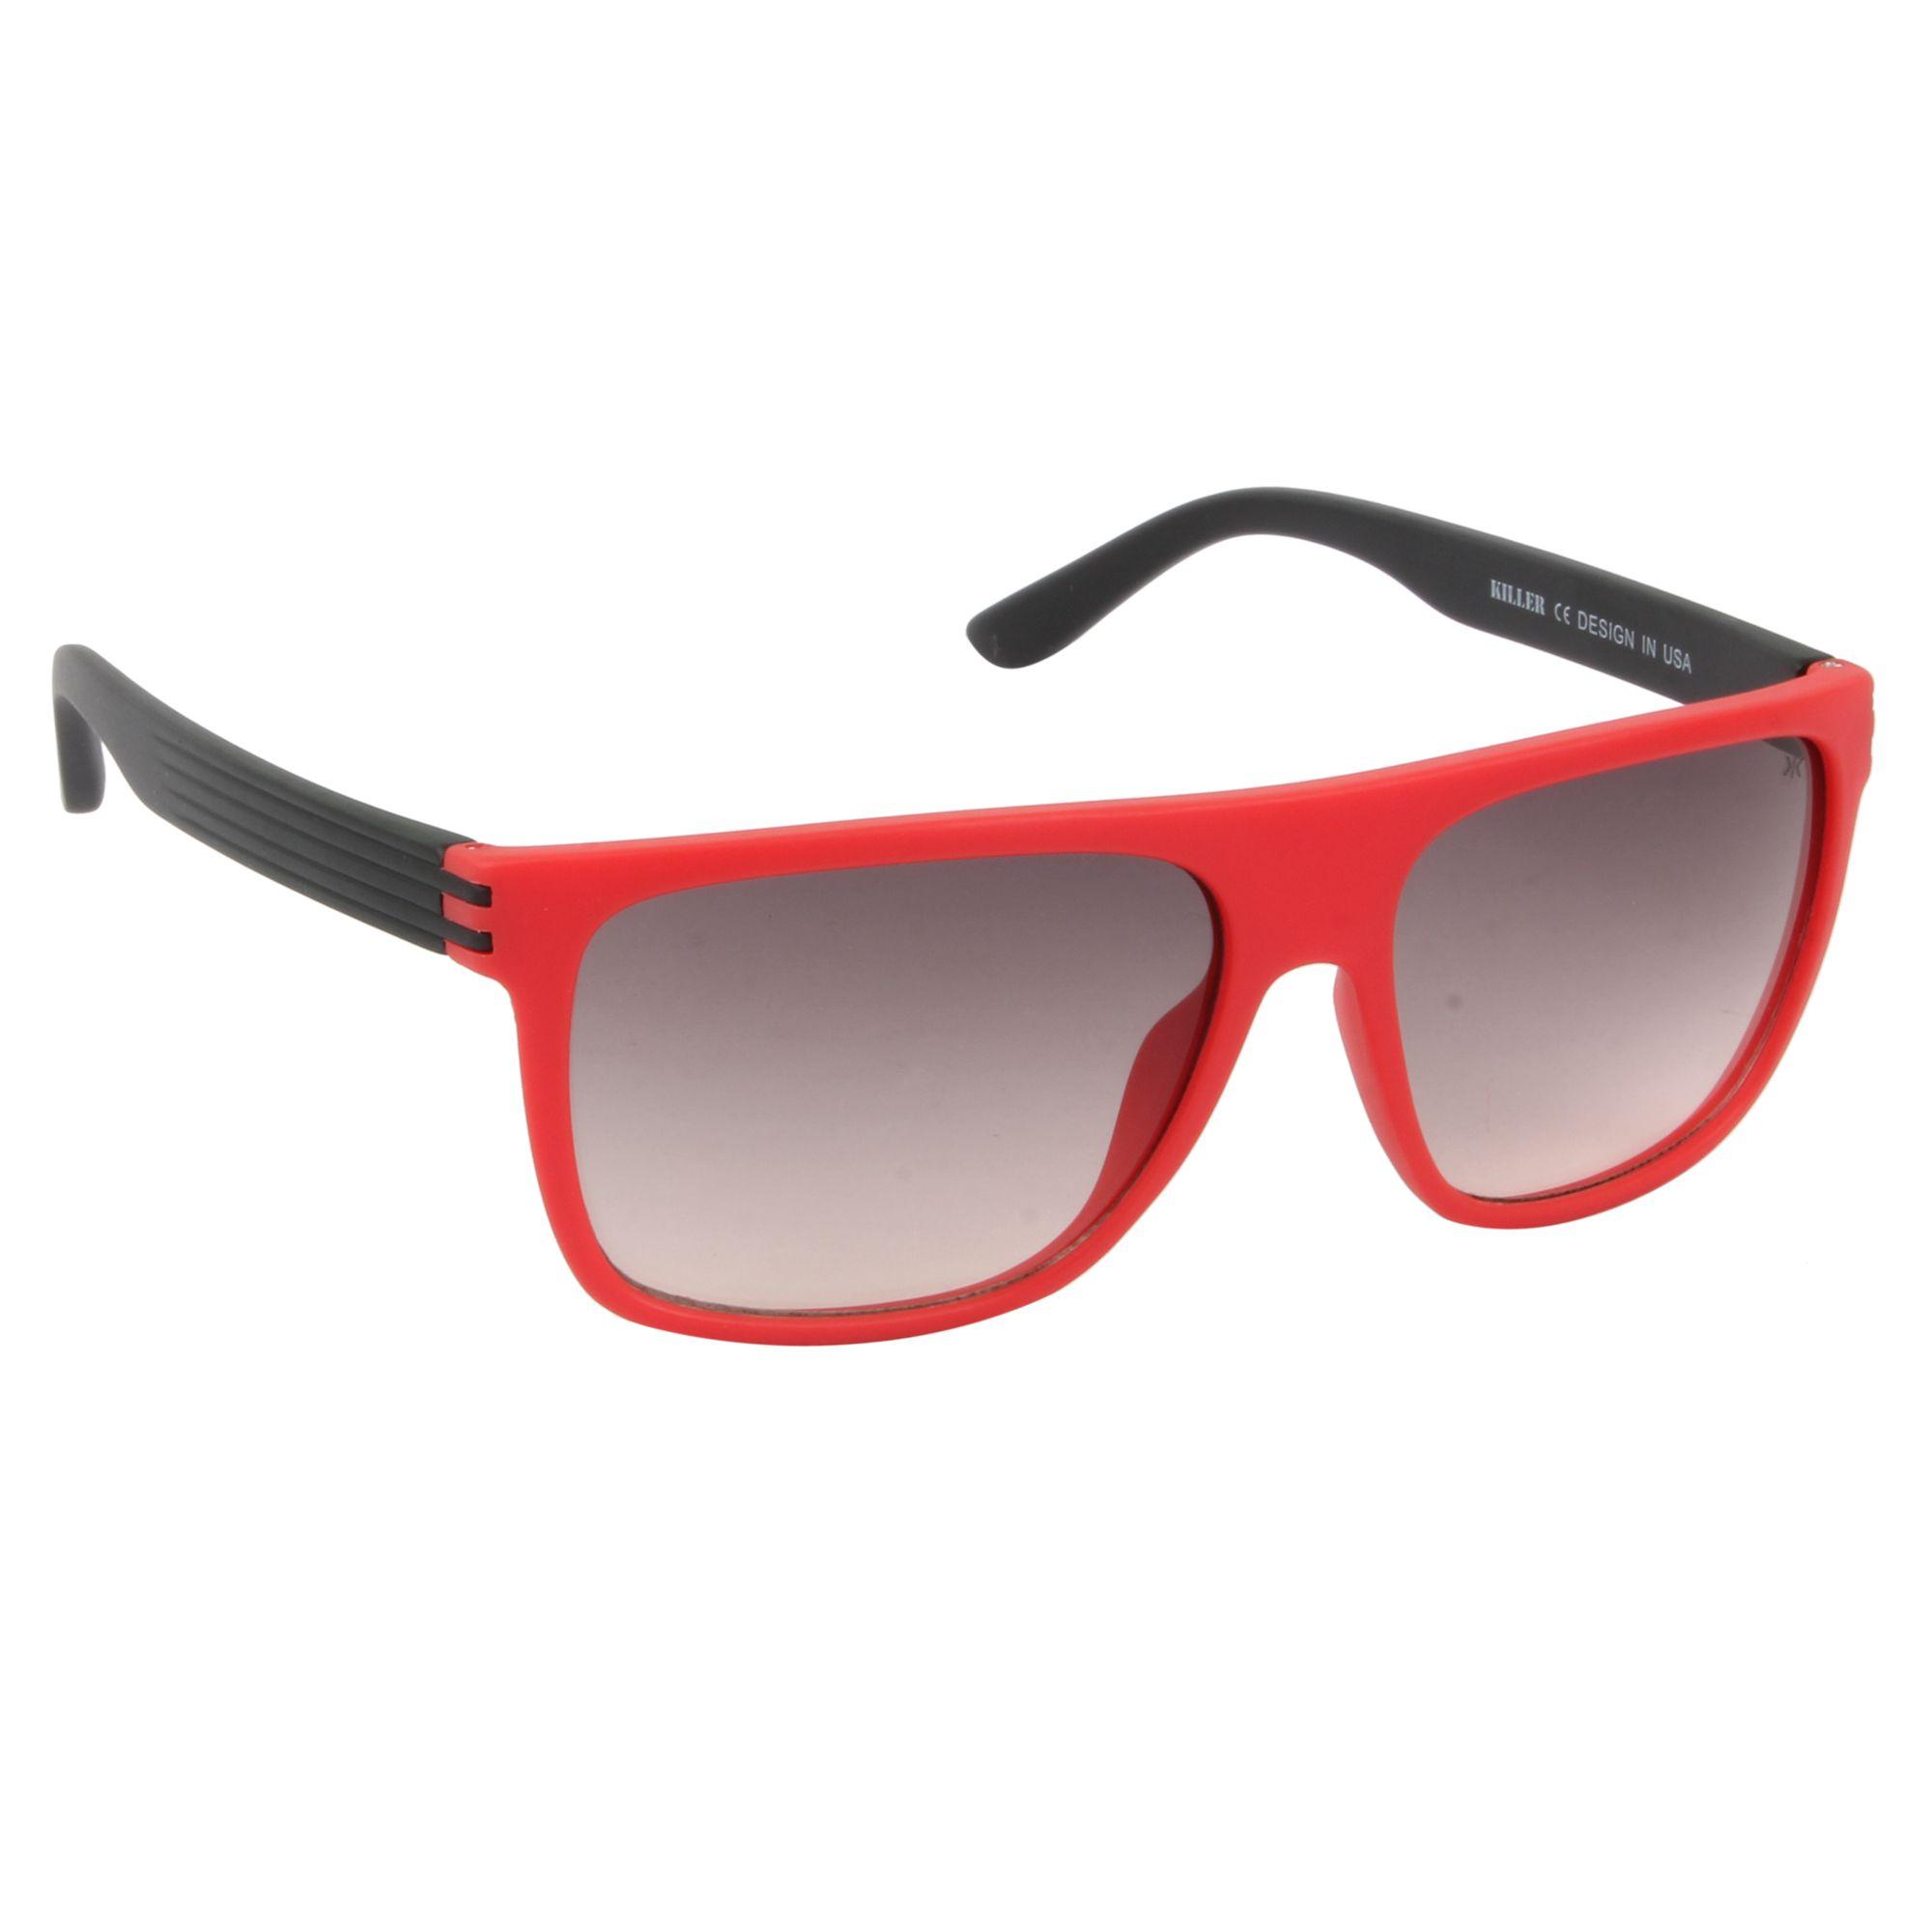 KILLER Grey Square Sunglasses ( KL3032 )